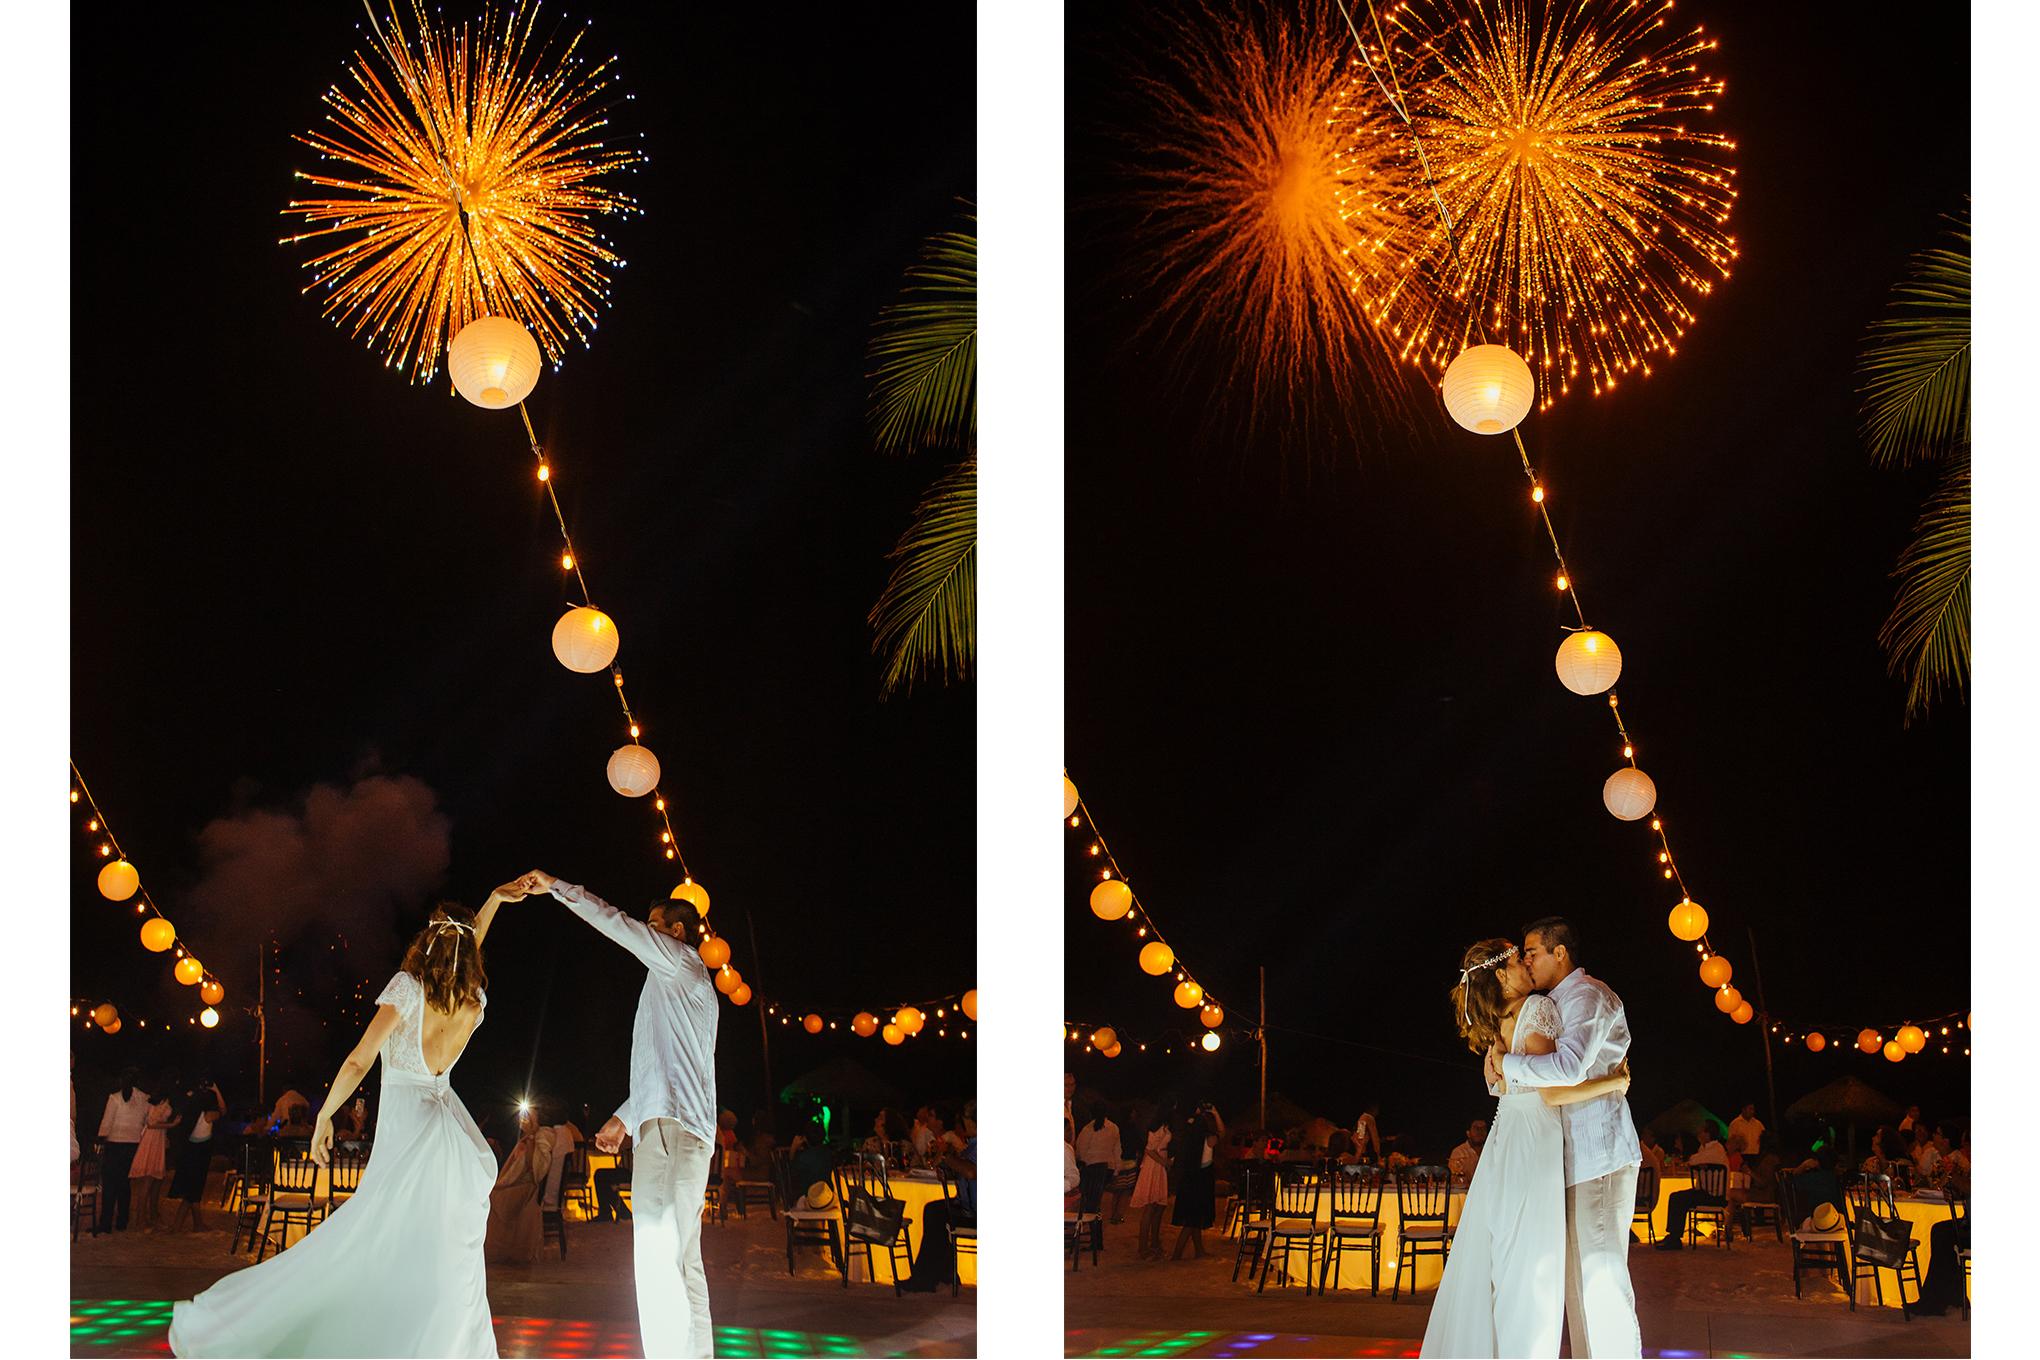 TIMETRAVEL_WEDDING_PHOTOGRAPHY_YUCATAN_DESTINATION_TECNOHOTEL_BEACH_FIRST_DANCE.jpg